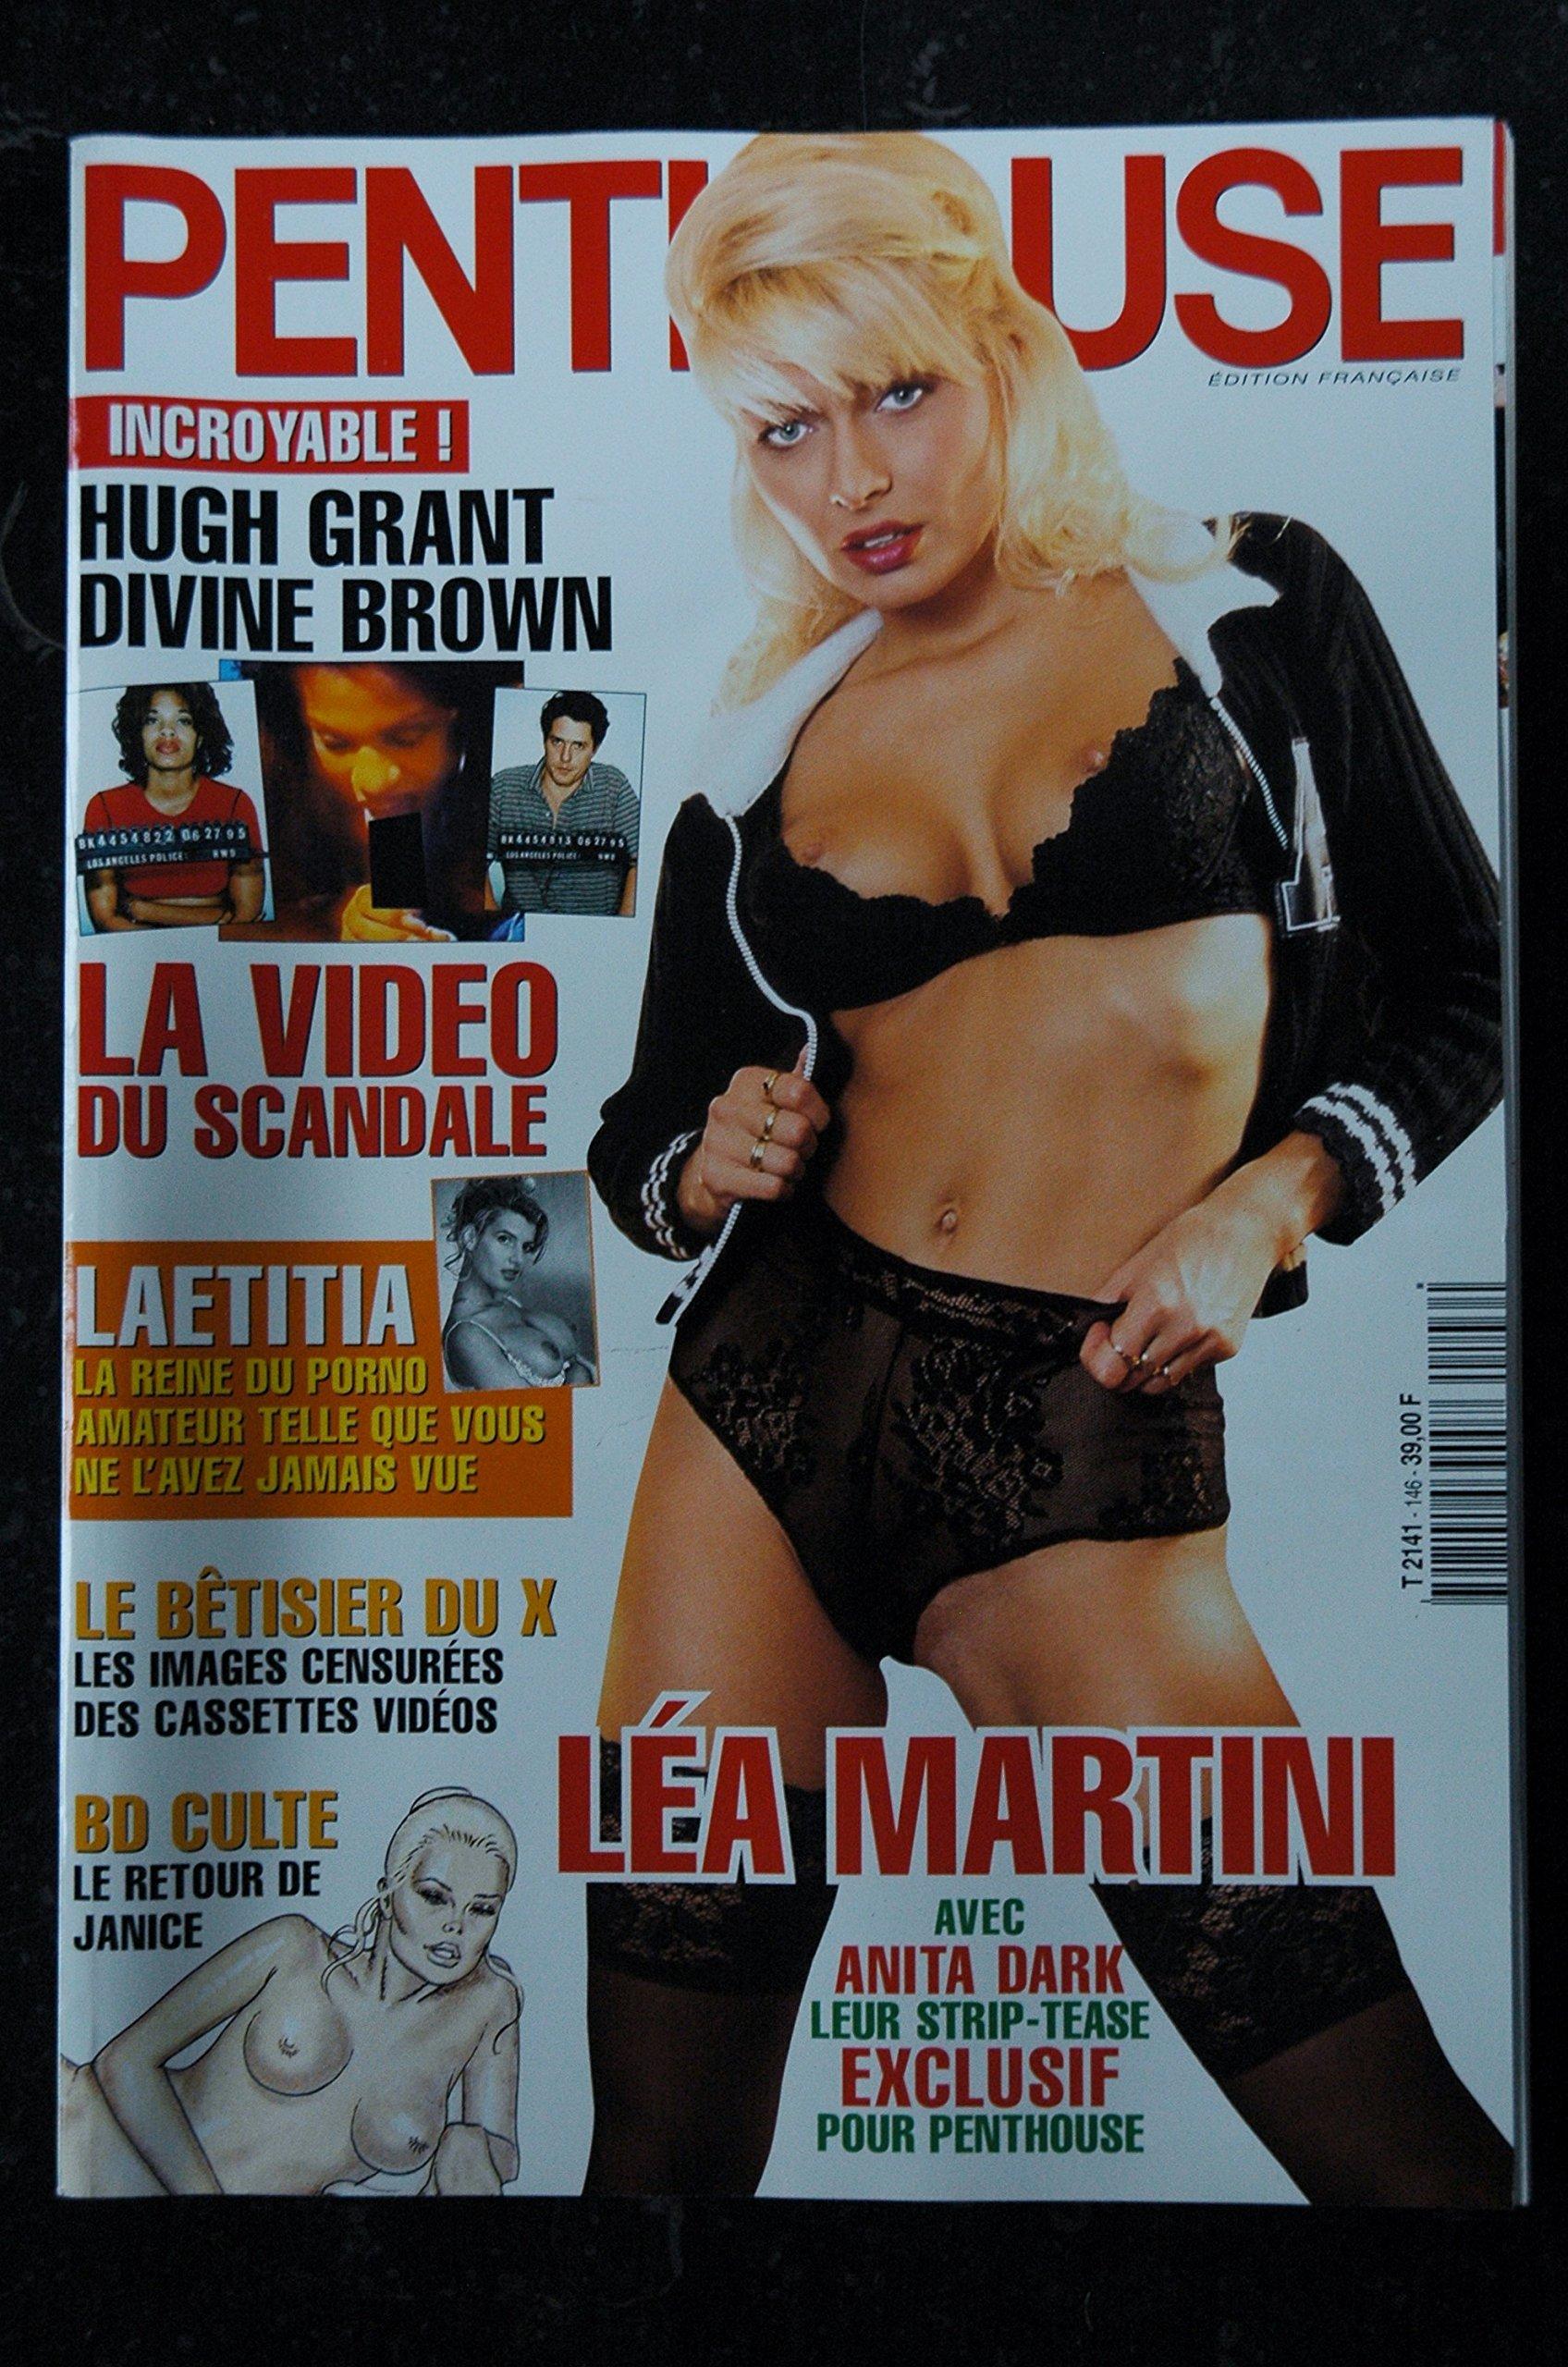 Penthouse  Latitia Lea Martini Anita Dark Janice Hugh Grant Scandale Betisier Erotic Amazon Ca Les Tresors D Emmanuelle Books